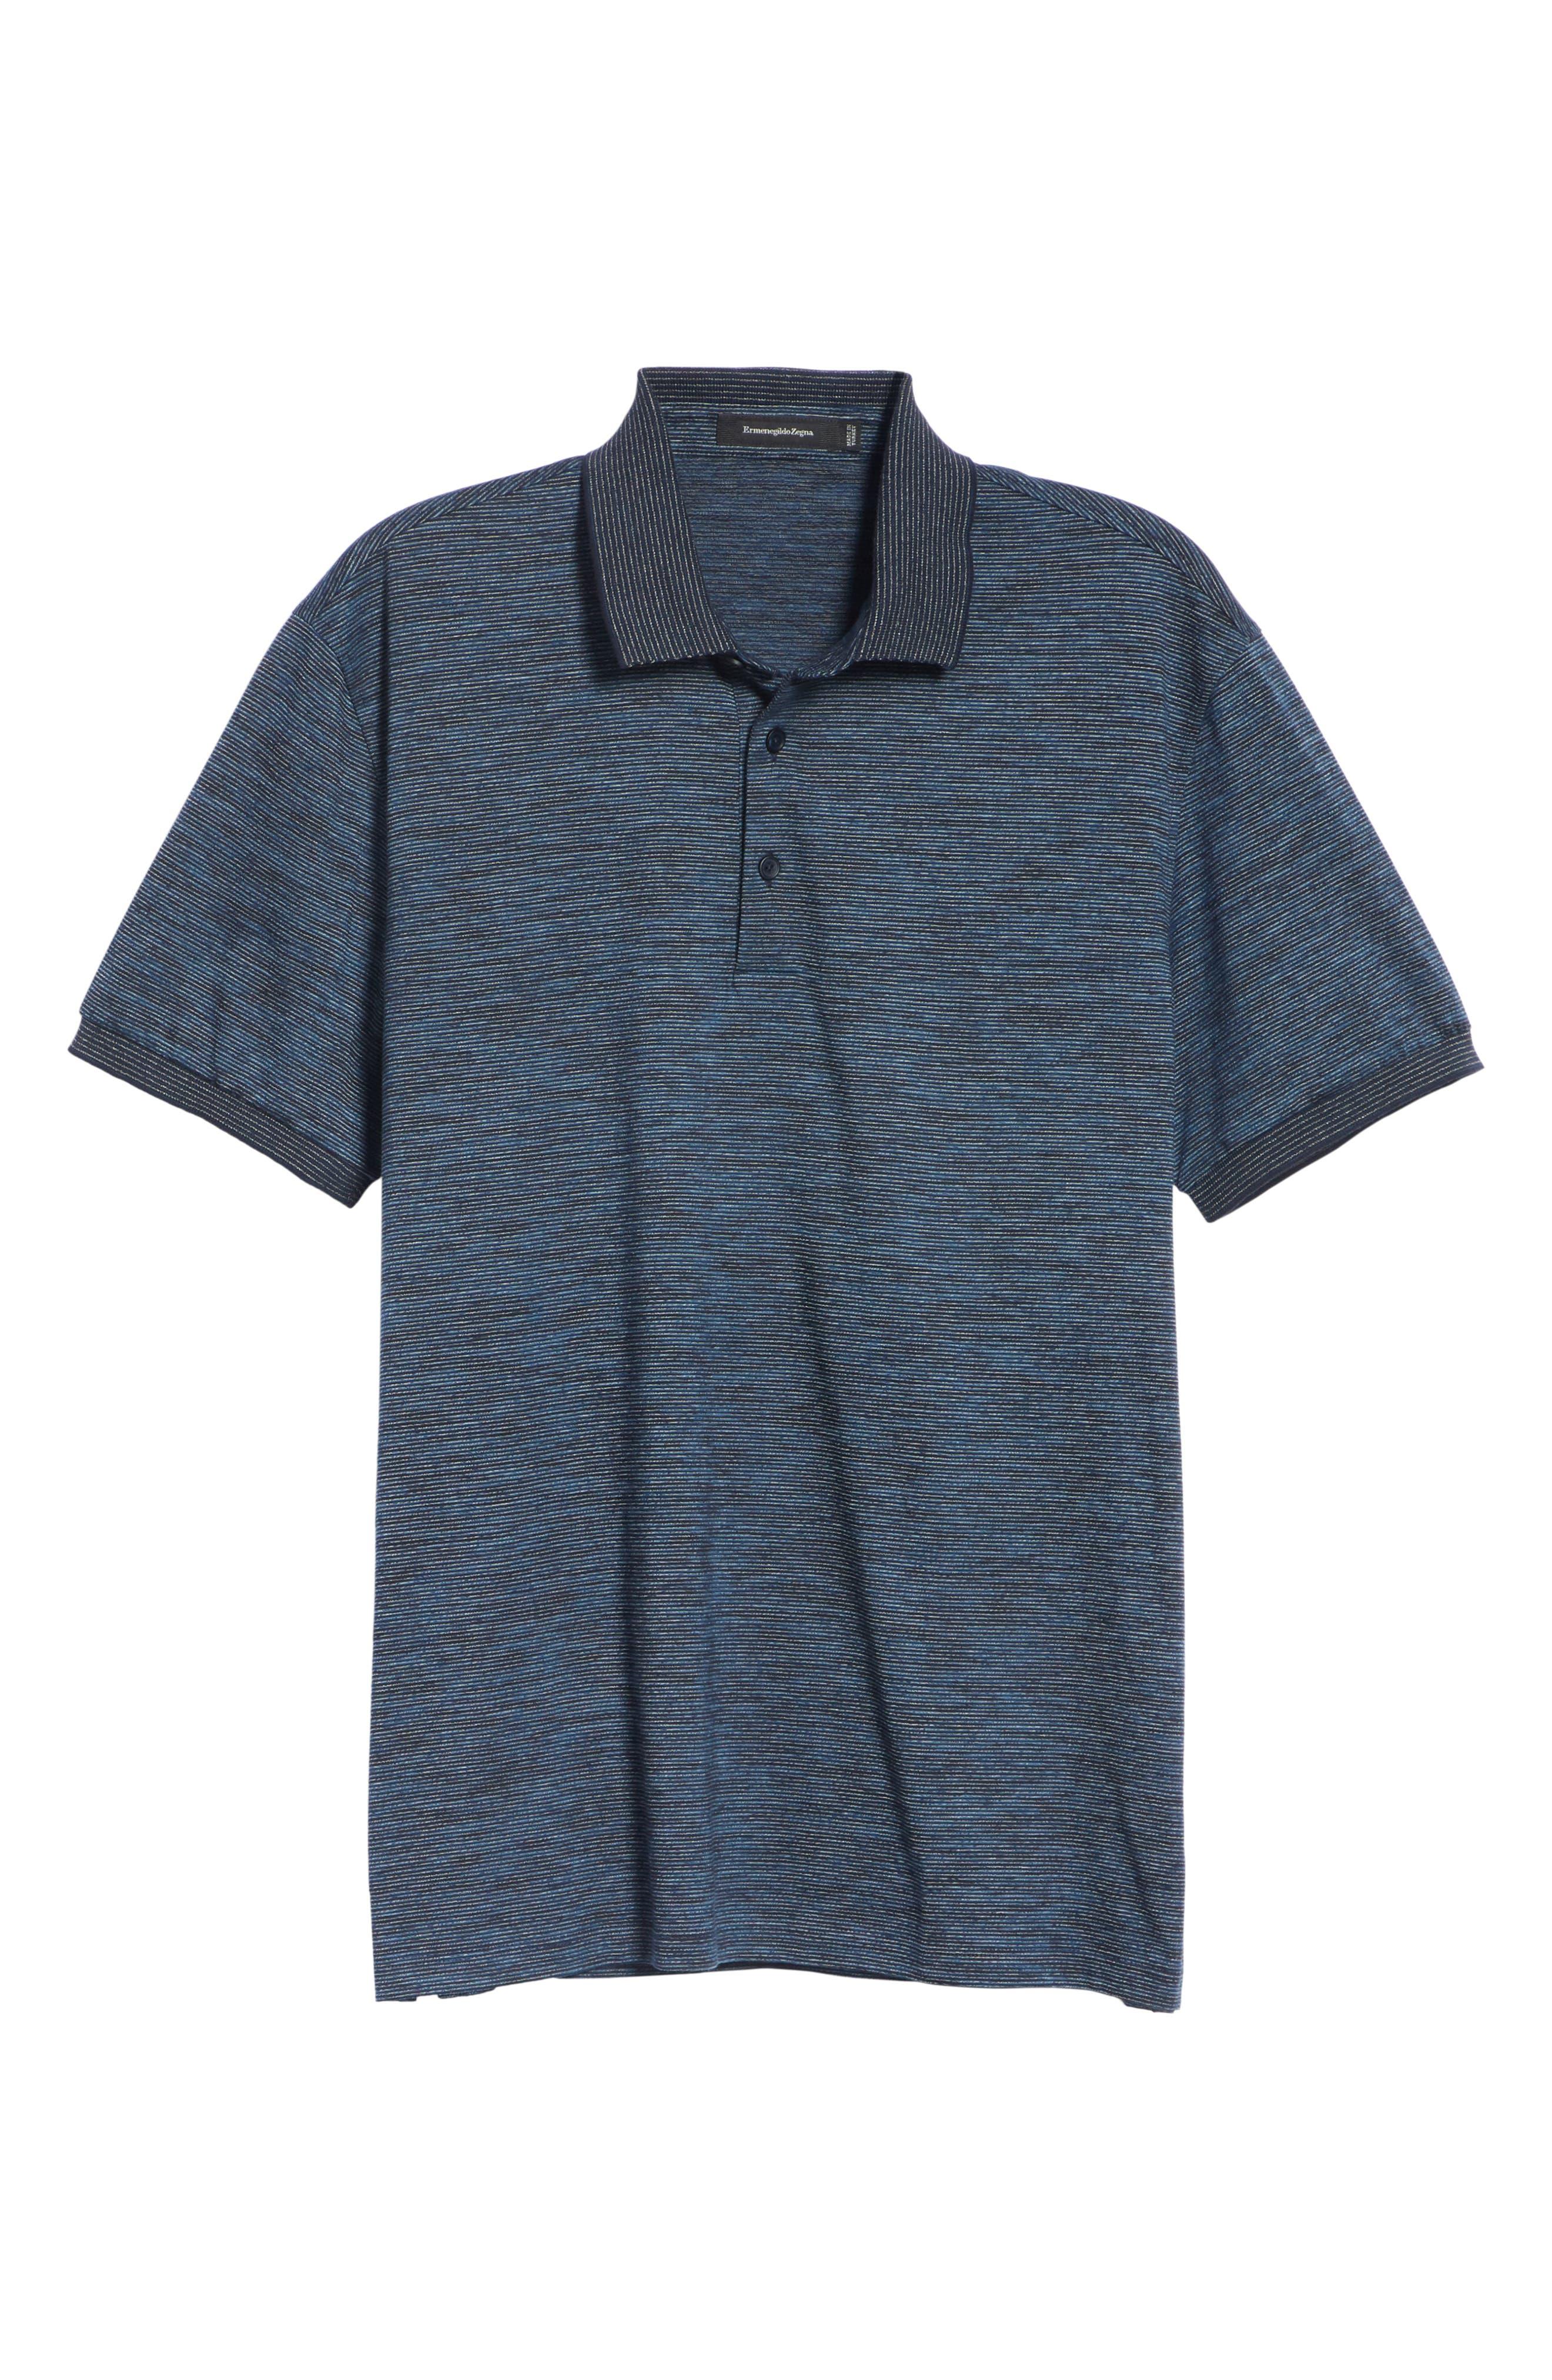 Cotton Polo Shirt,                             Alternate thumbnail 6, color,                             NAVY